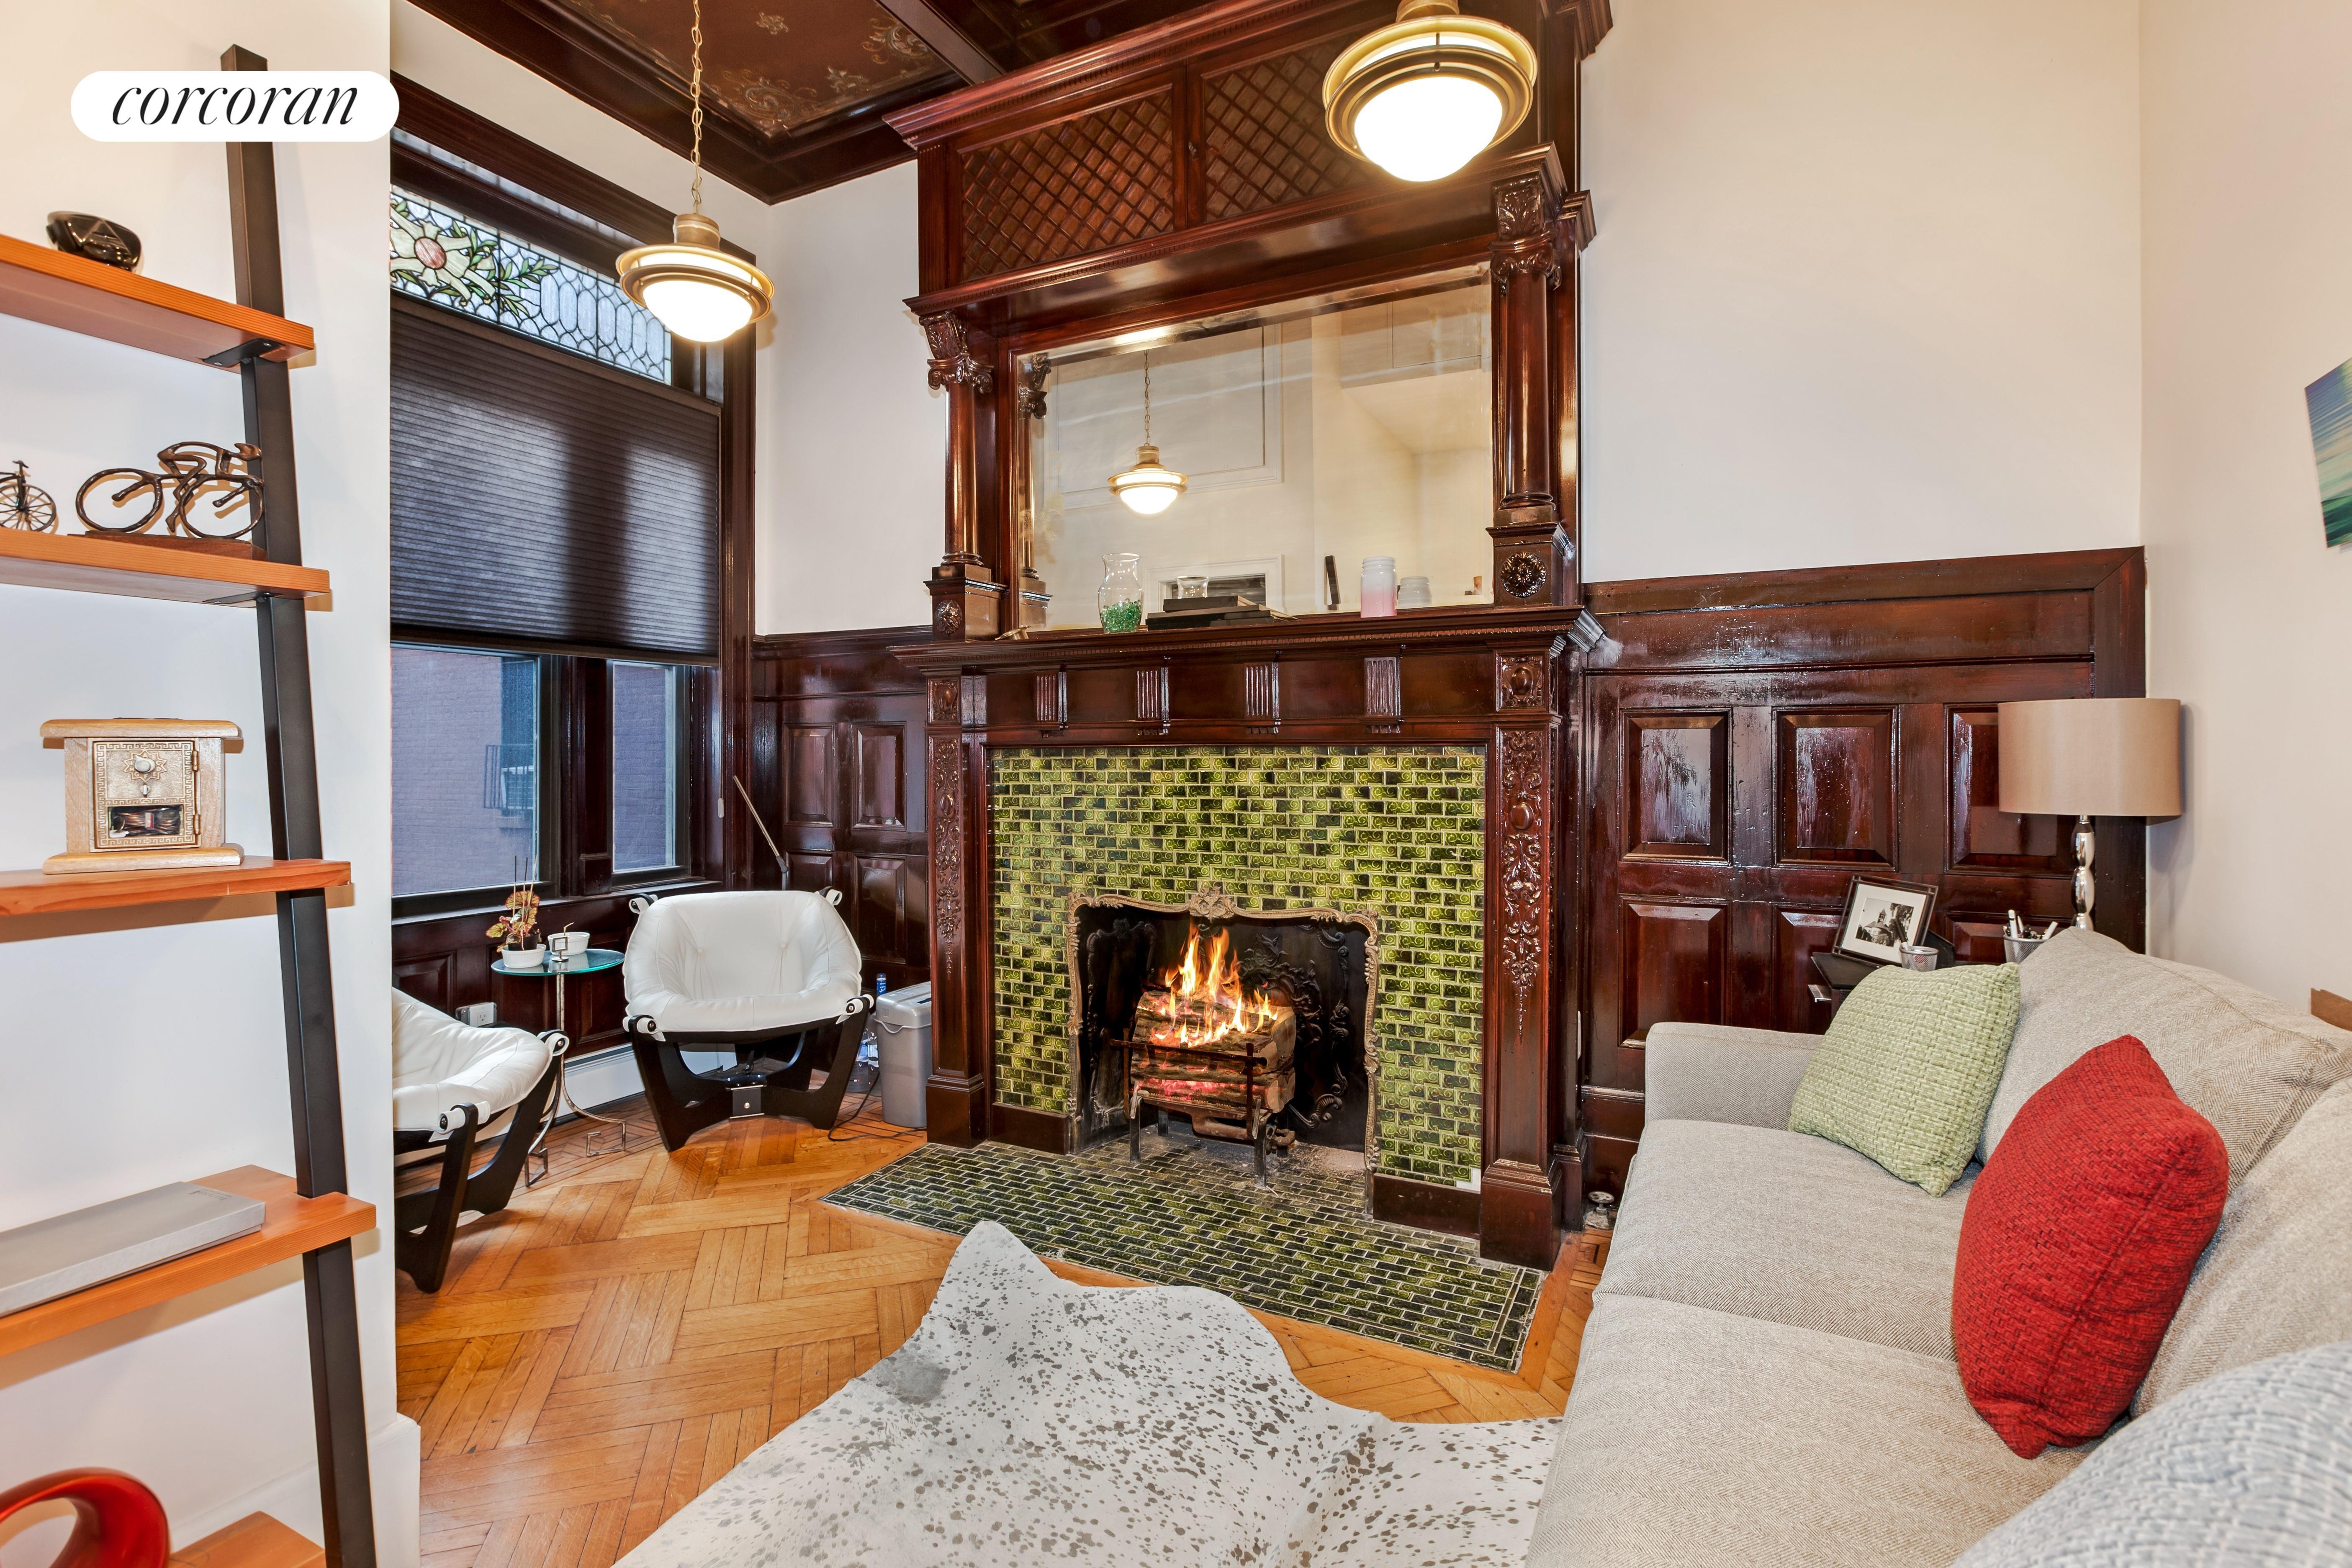 672 Saint Marks Avenue, Apt 1, Brooklyn, New York 11216